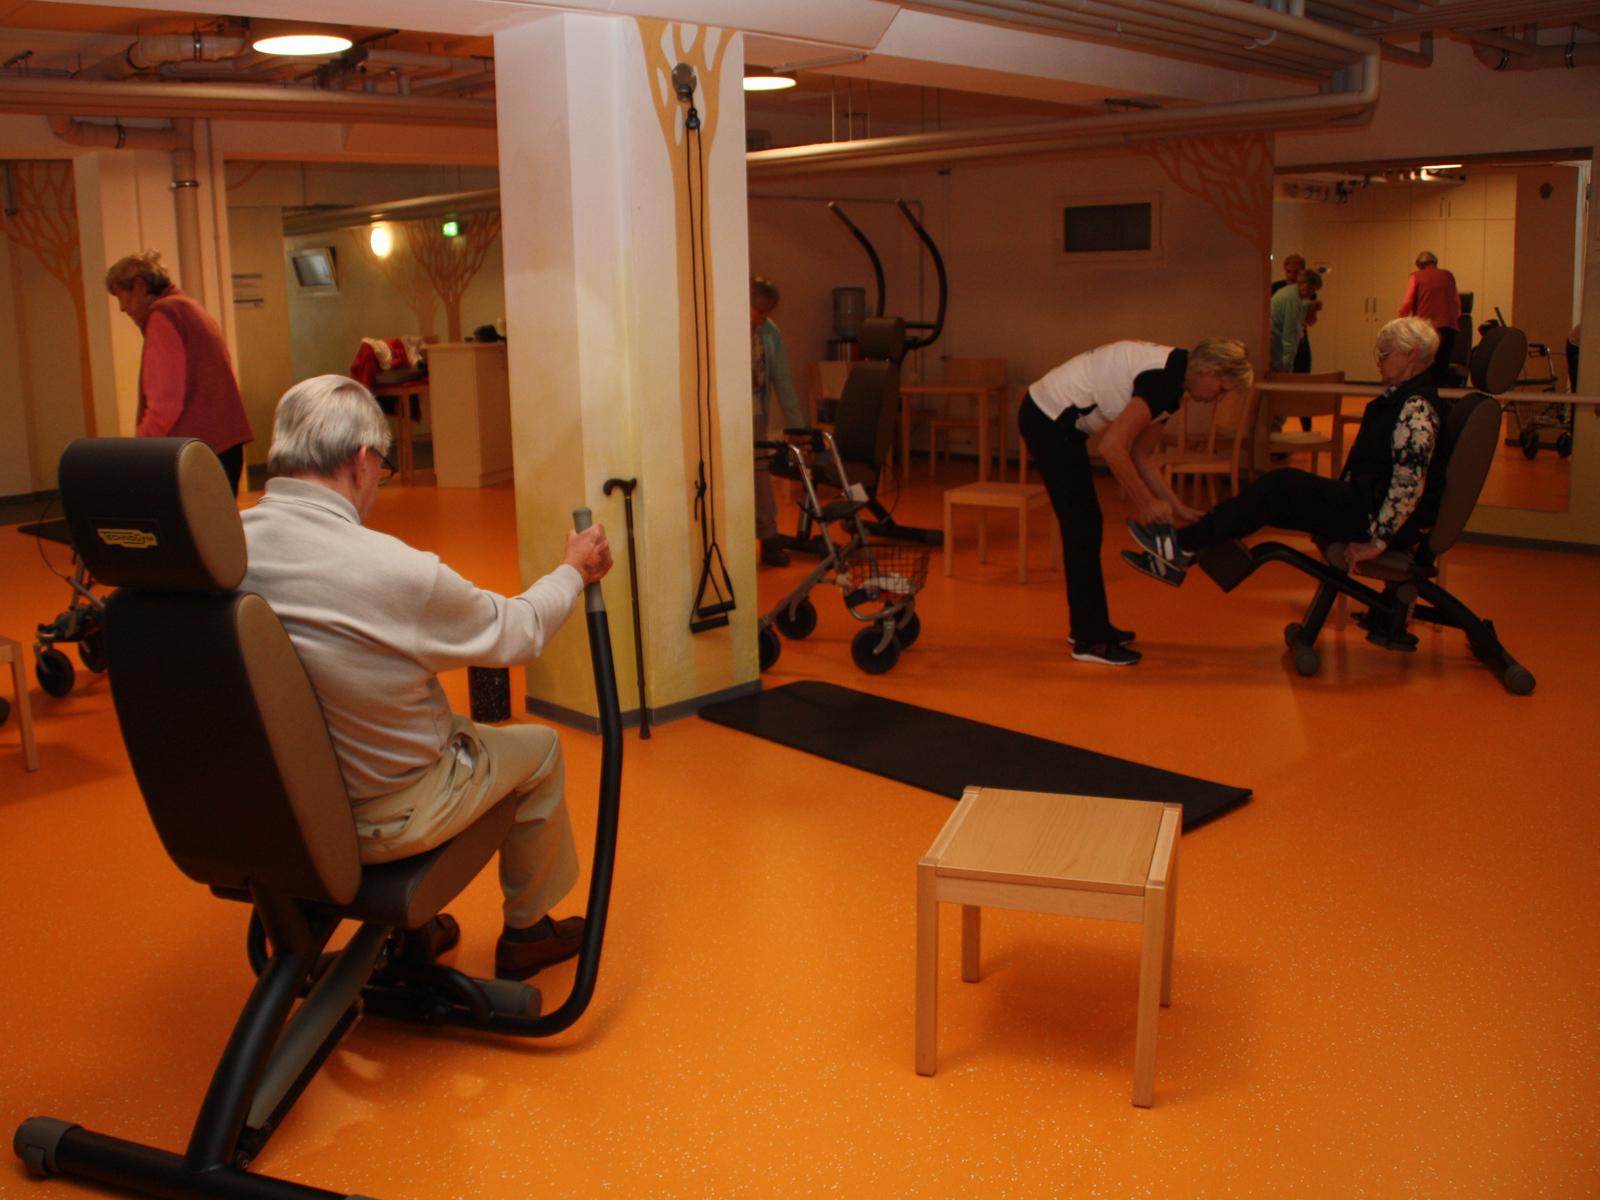 Seniorengerechter Fitnessraum